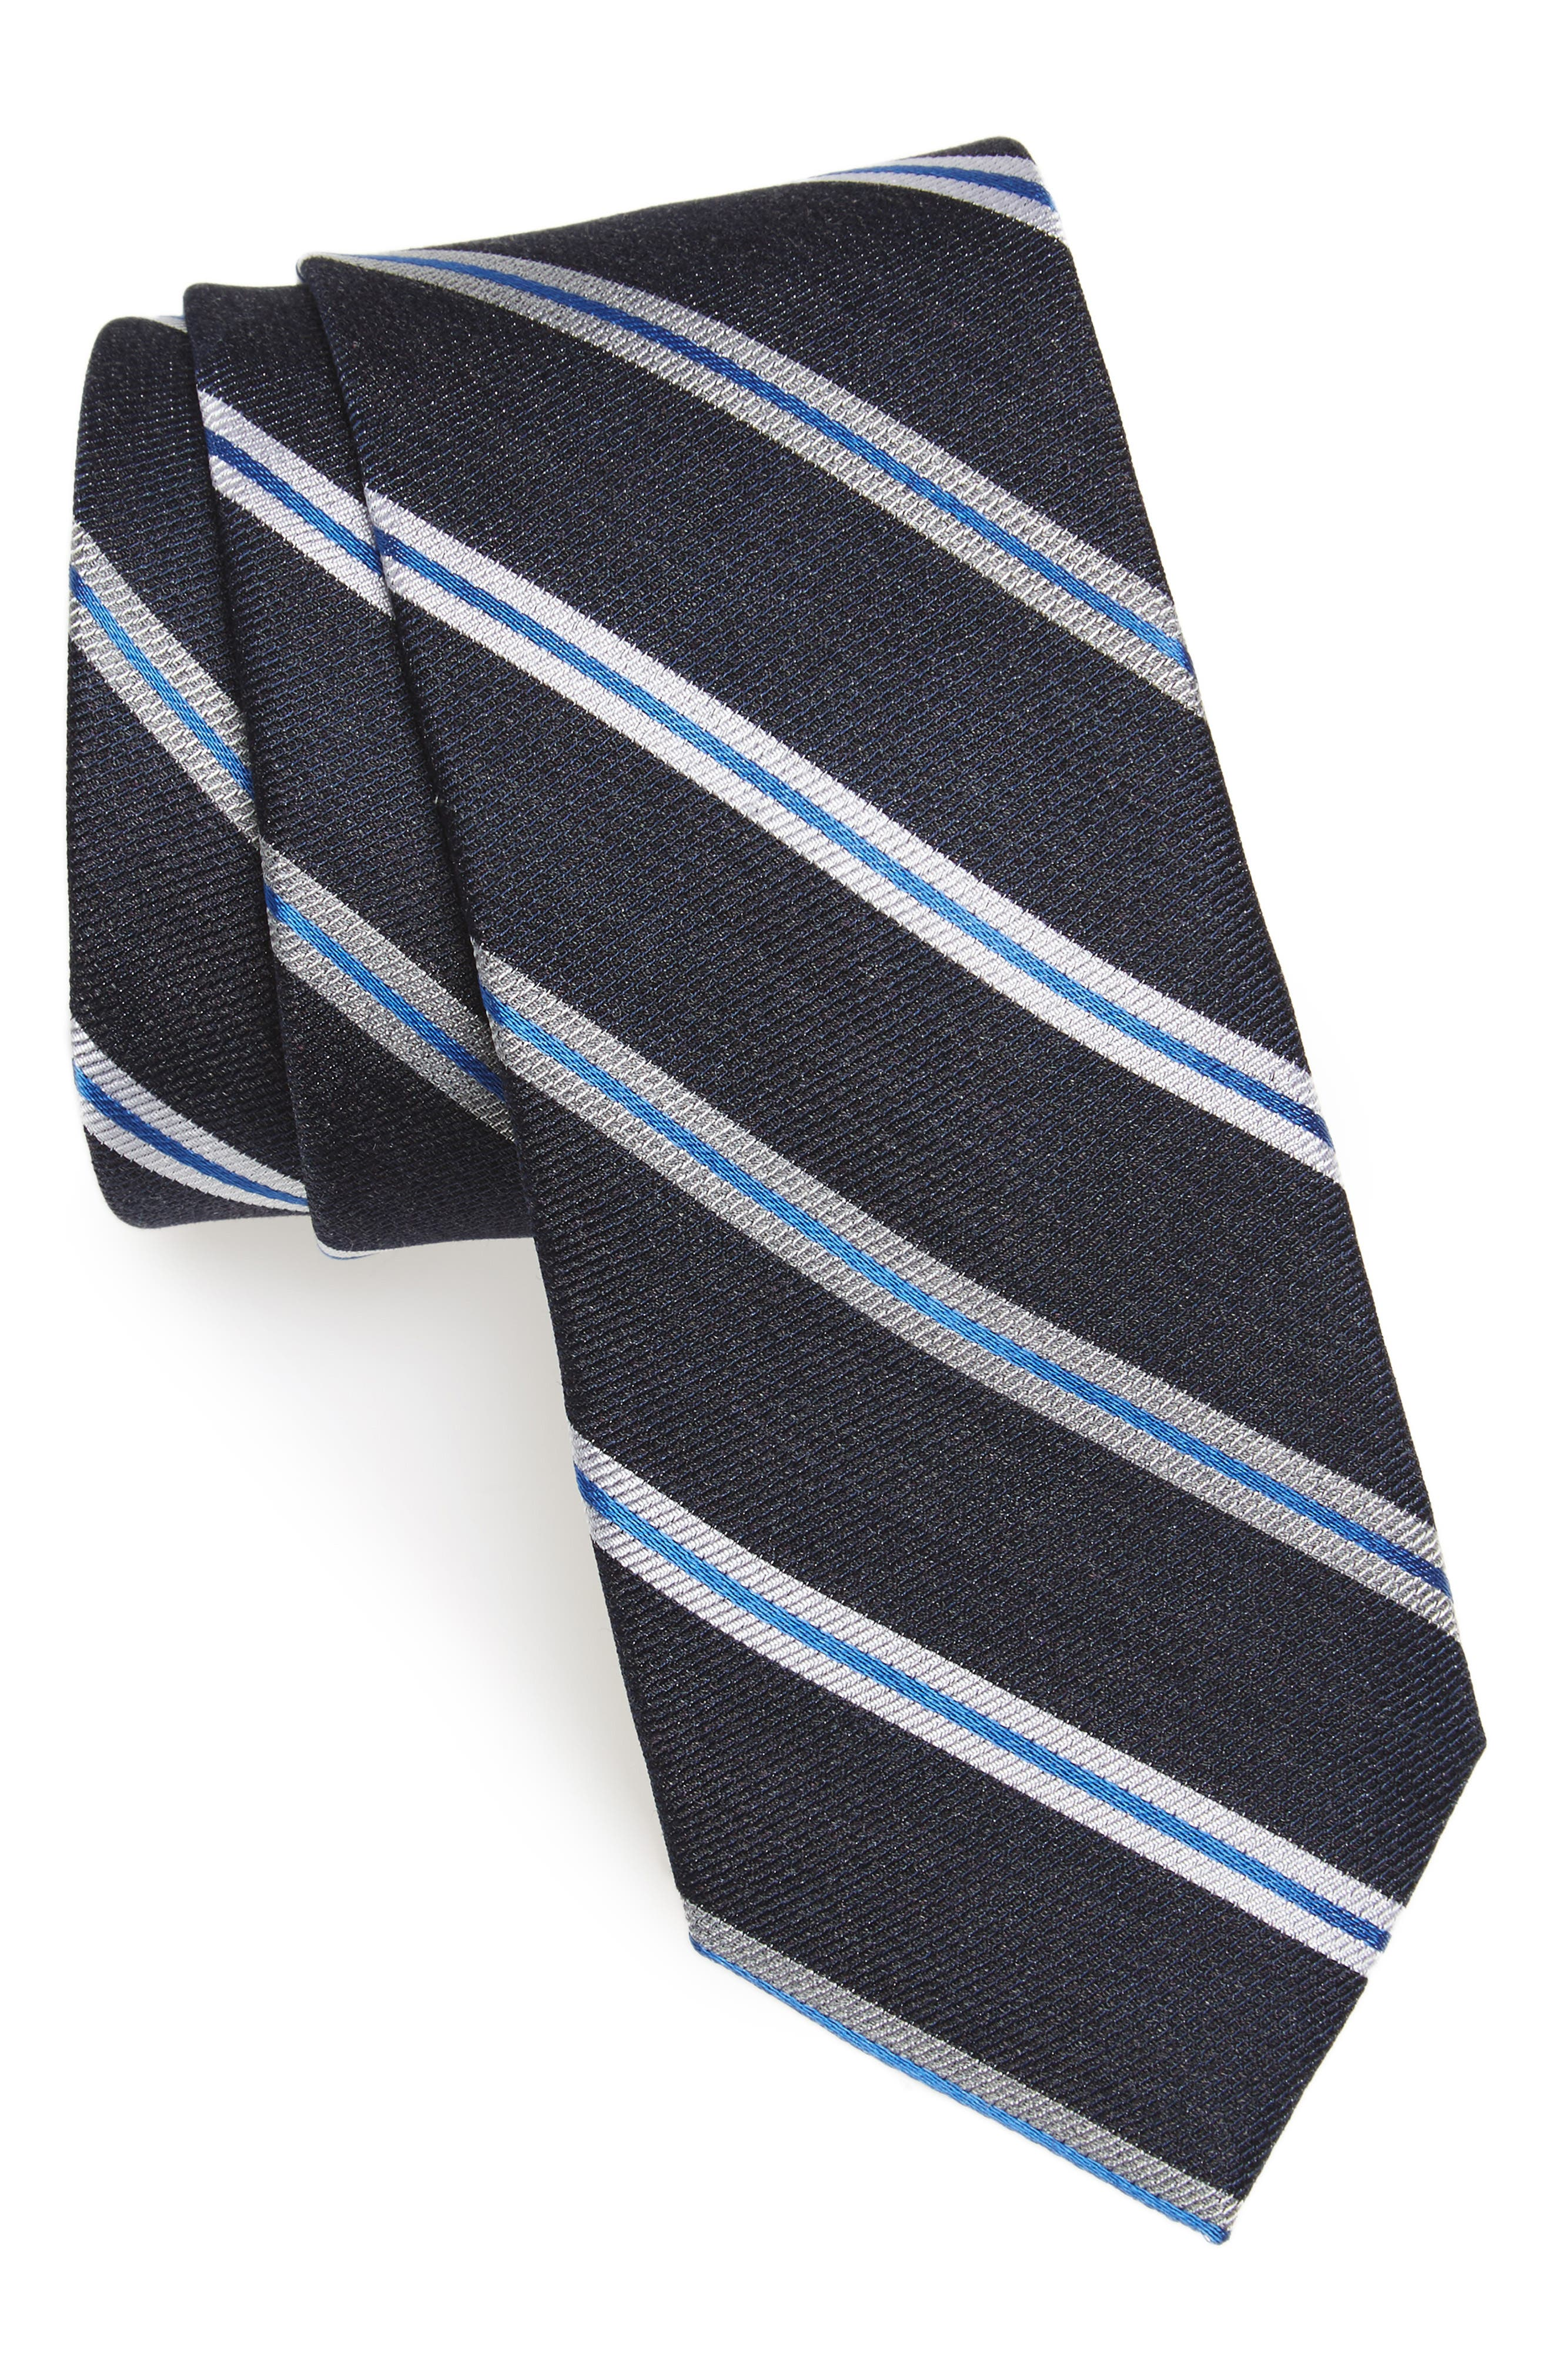 Nordstrom Men's Shop Crosby Stripe Silk Blend Tie